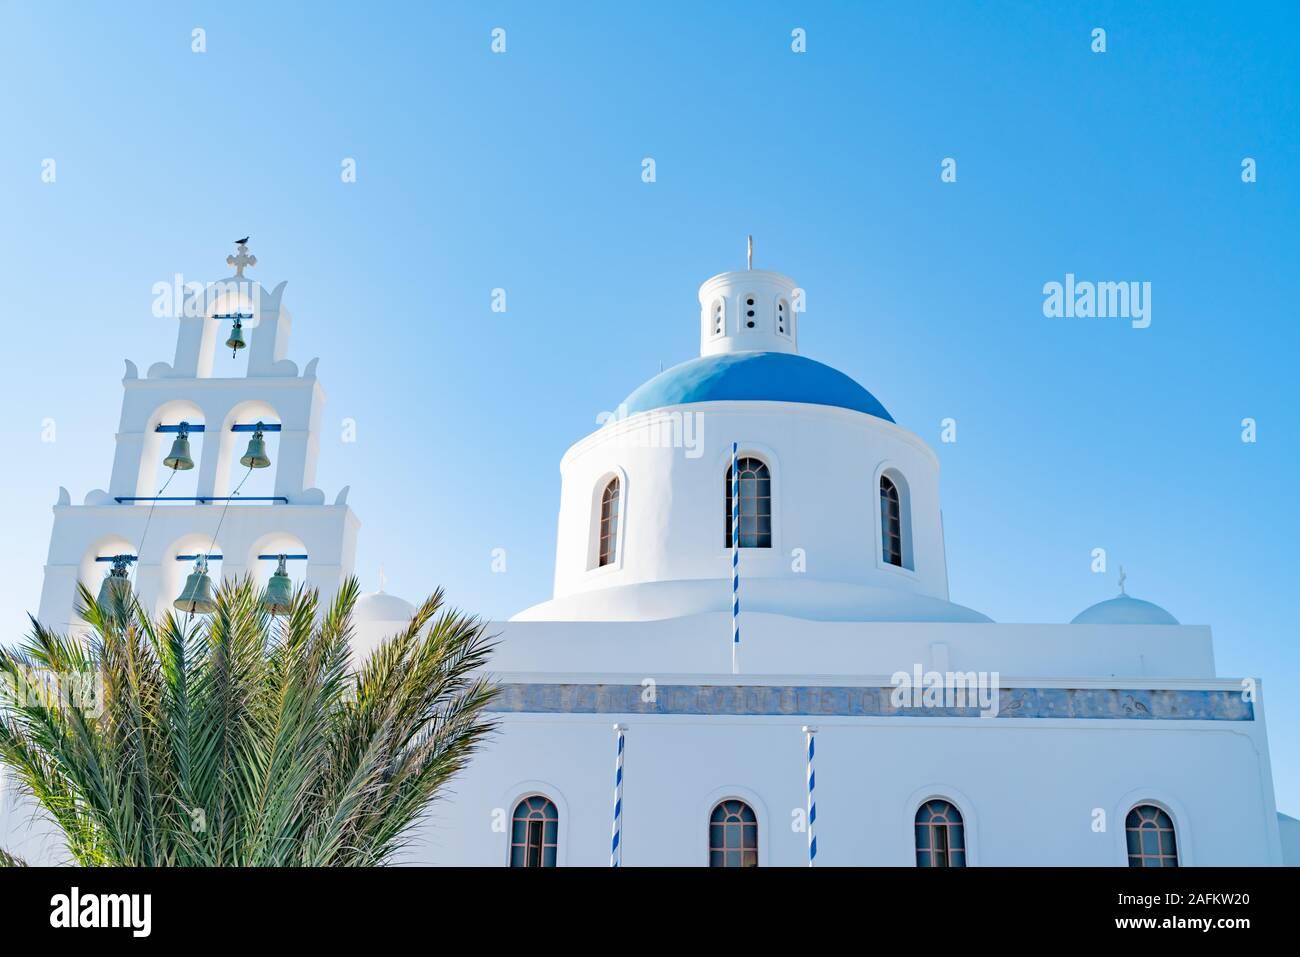 Oia, Grecia - El 7 de agosto de 2019; la iglesia de Panagia con seis campanario en Oia, Santorini en muros exteriores whitwashed cúpula azul brillante. Foto de stock